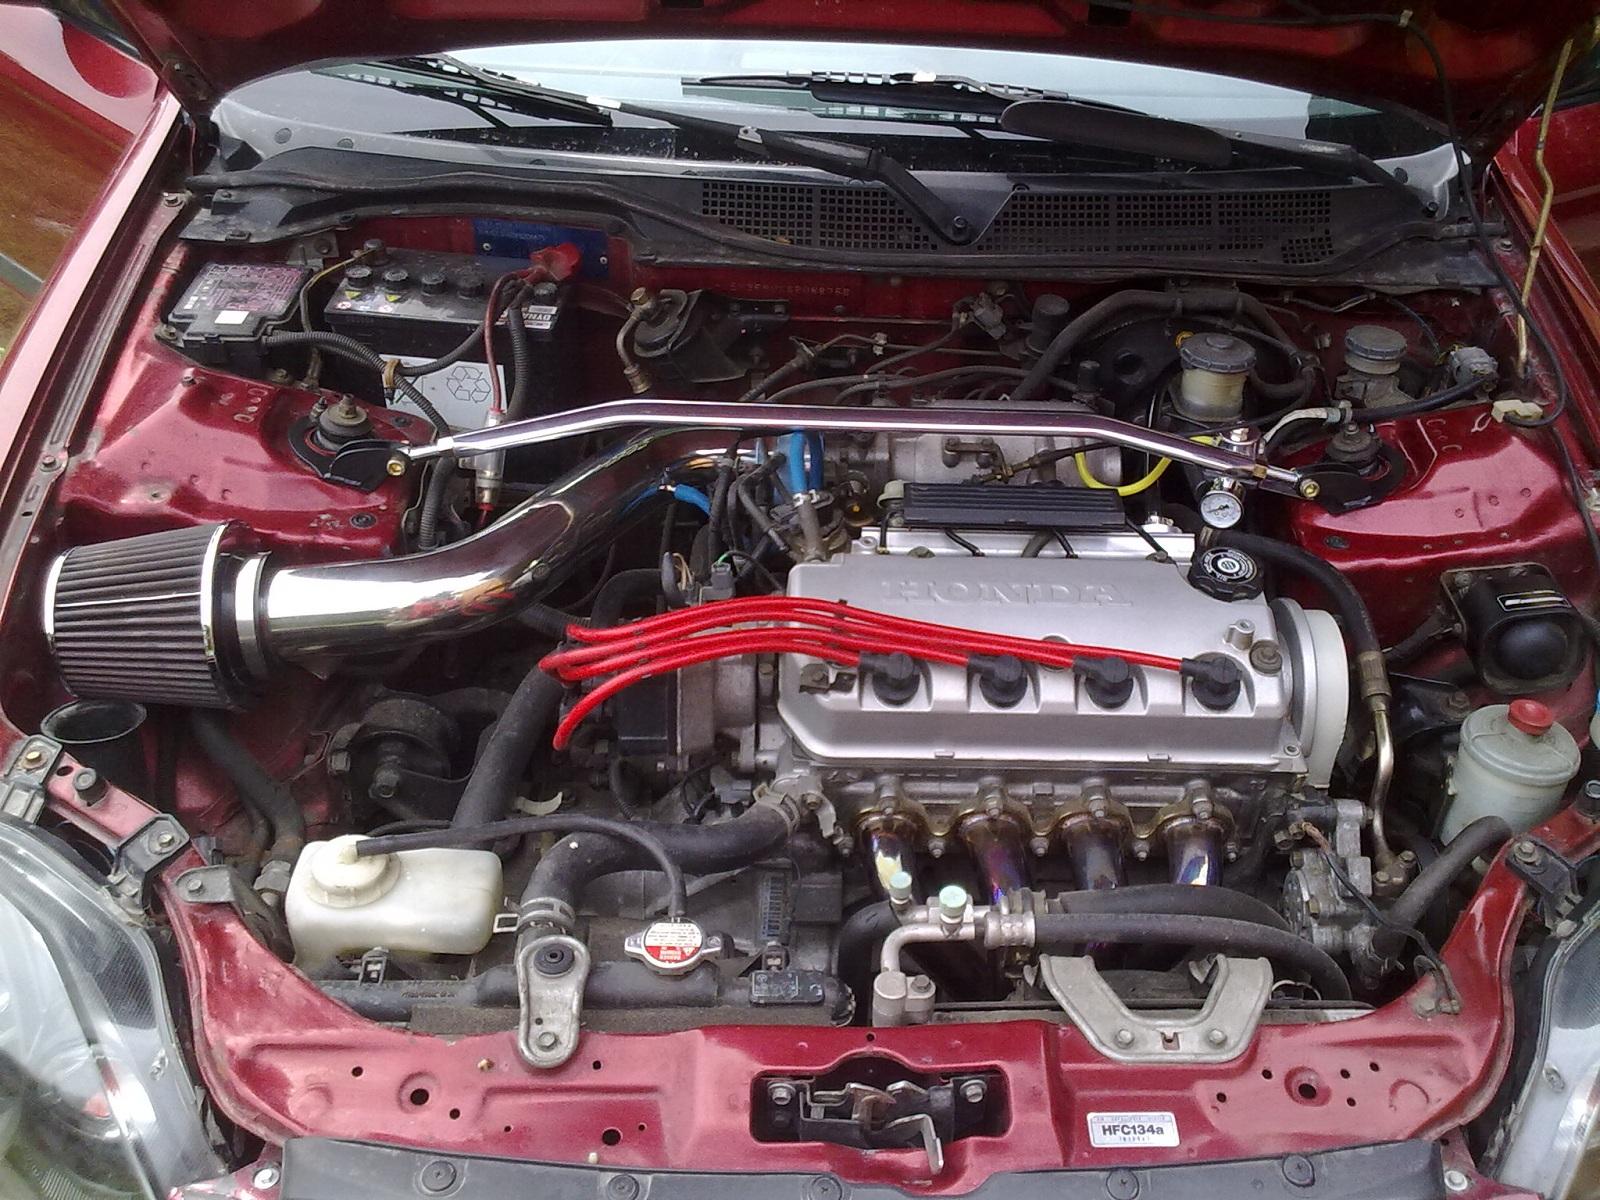 Honda civic 1.5 lsi tuning